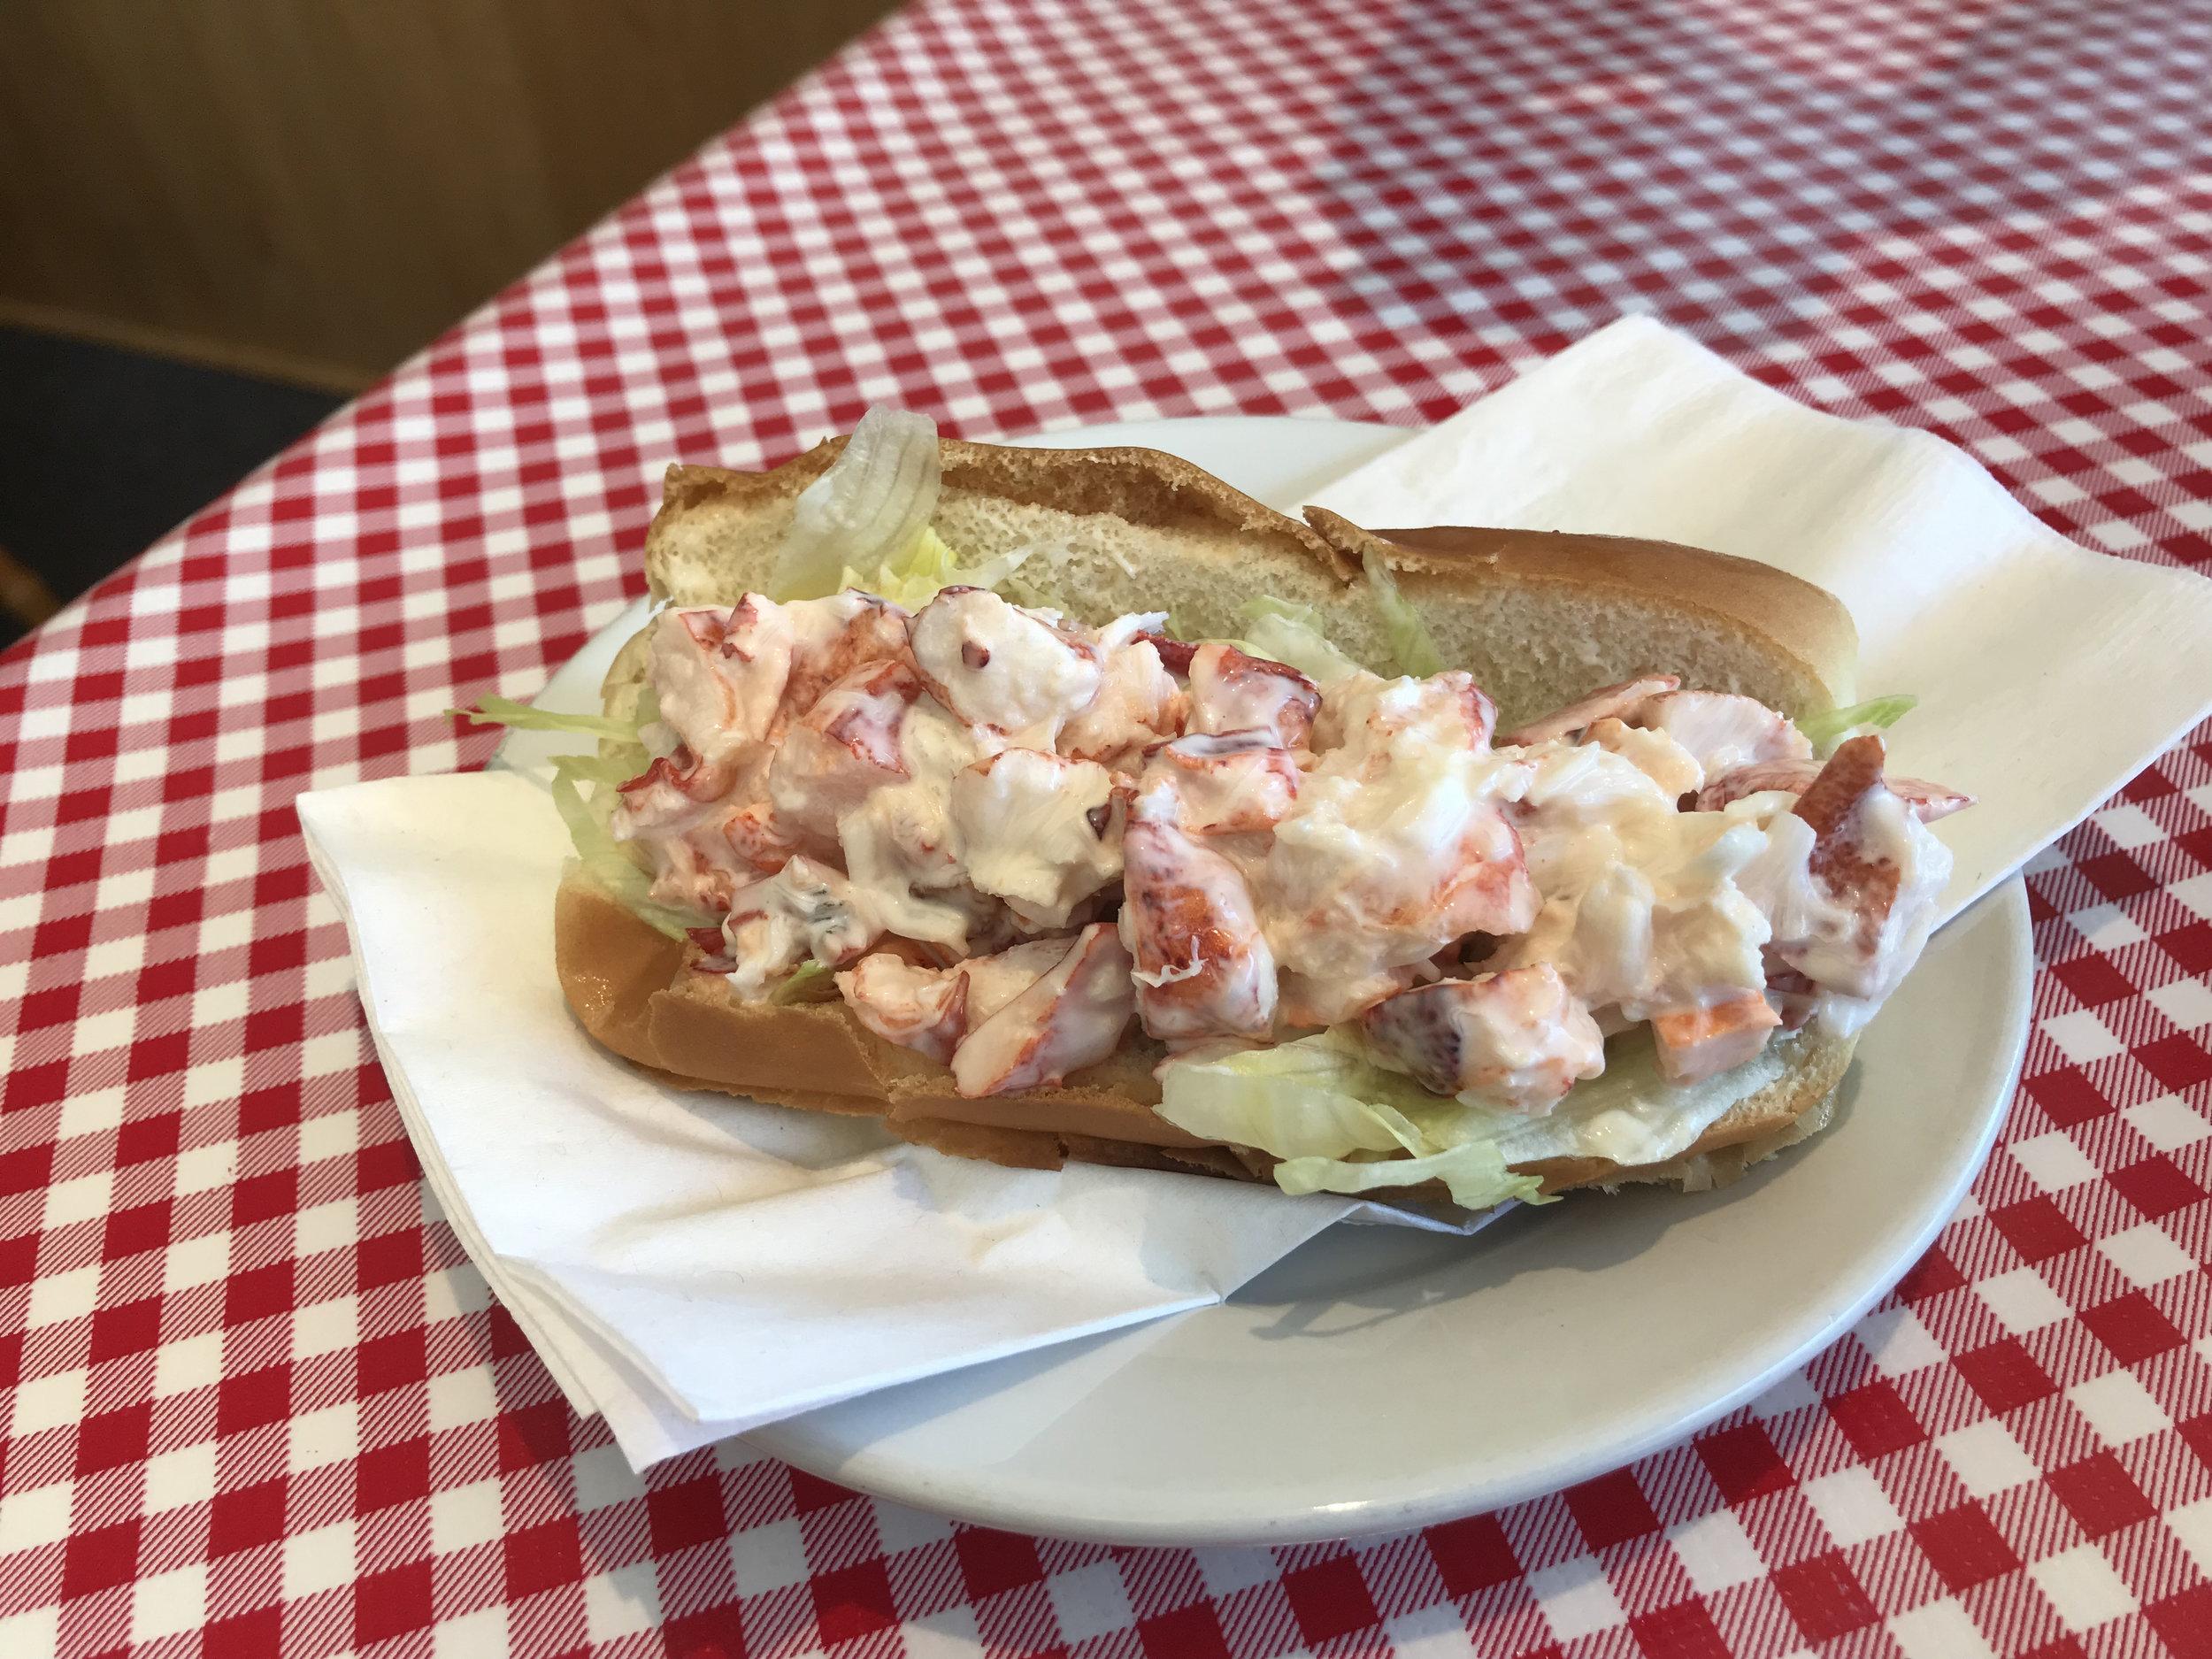 The LumberJack, Lobster Roll